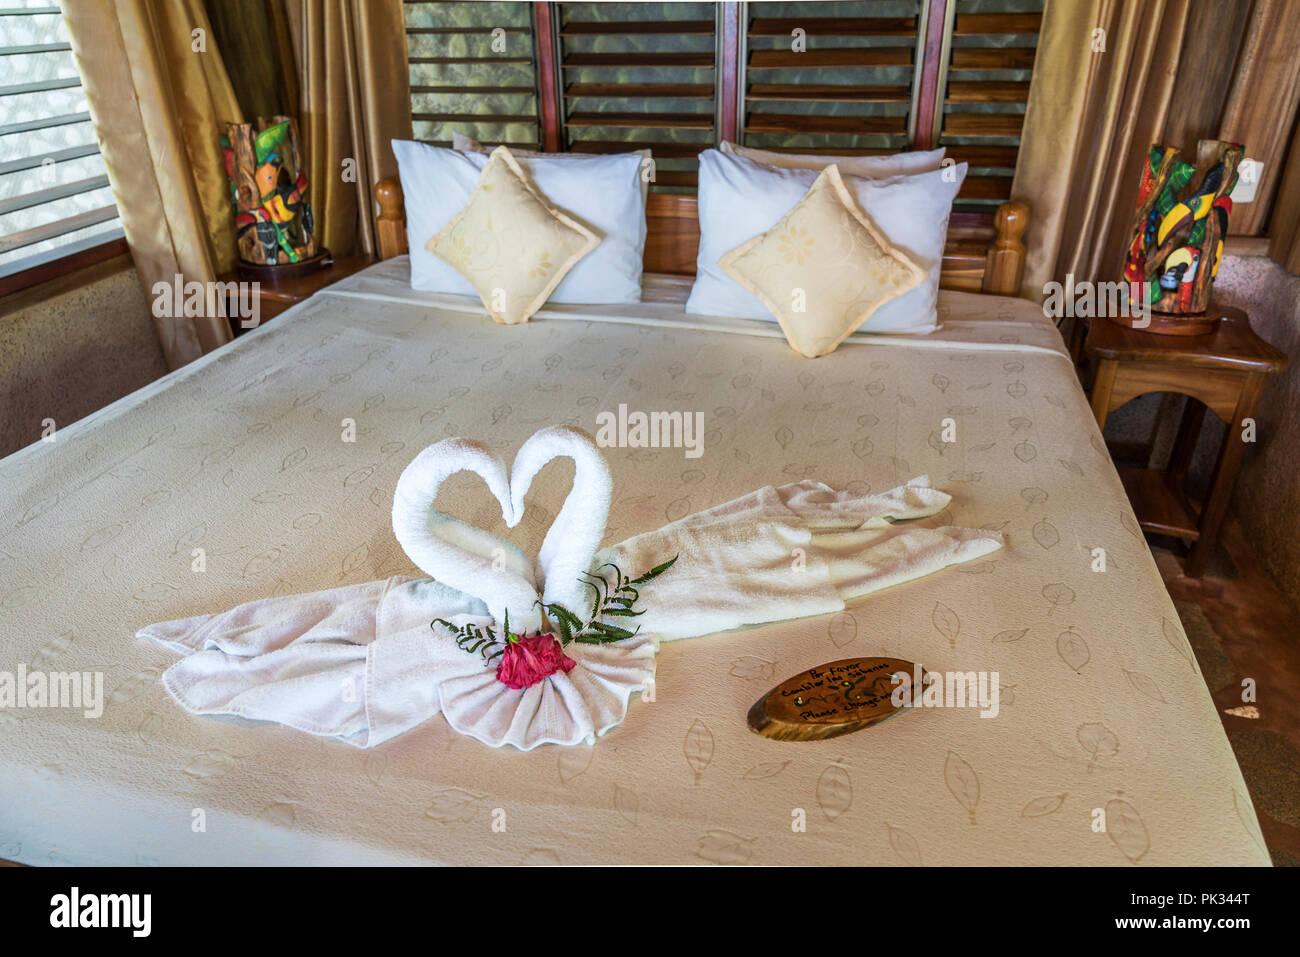 Towel displayed as Swans, LaCusinga Hotel, Costa Rica - Stock Image